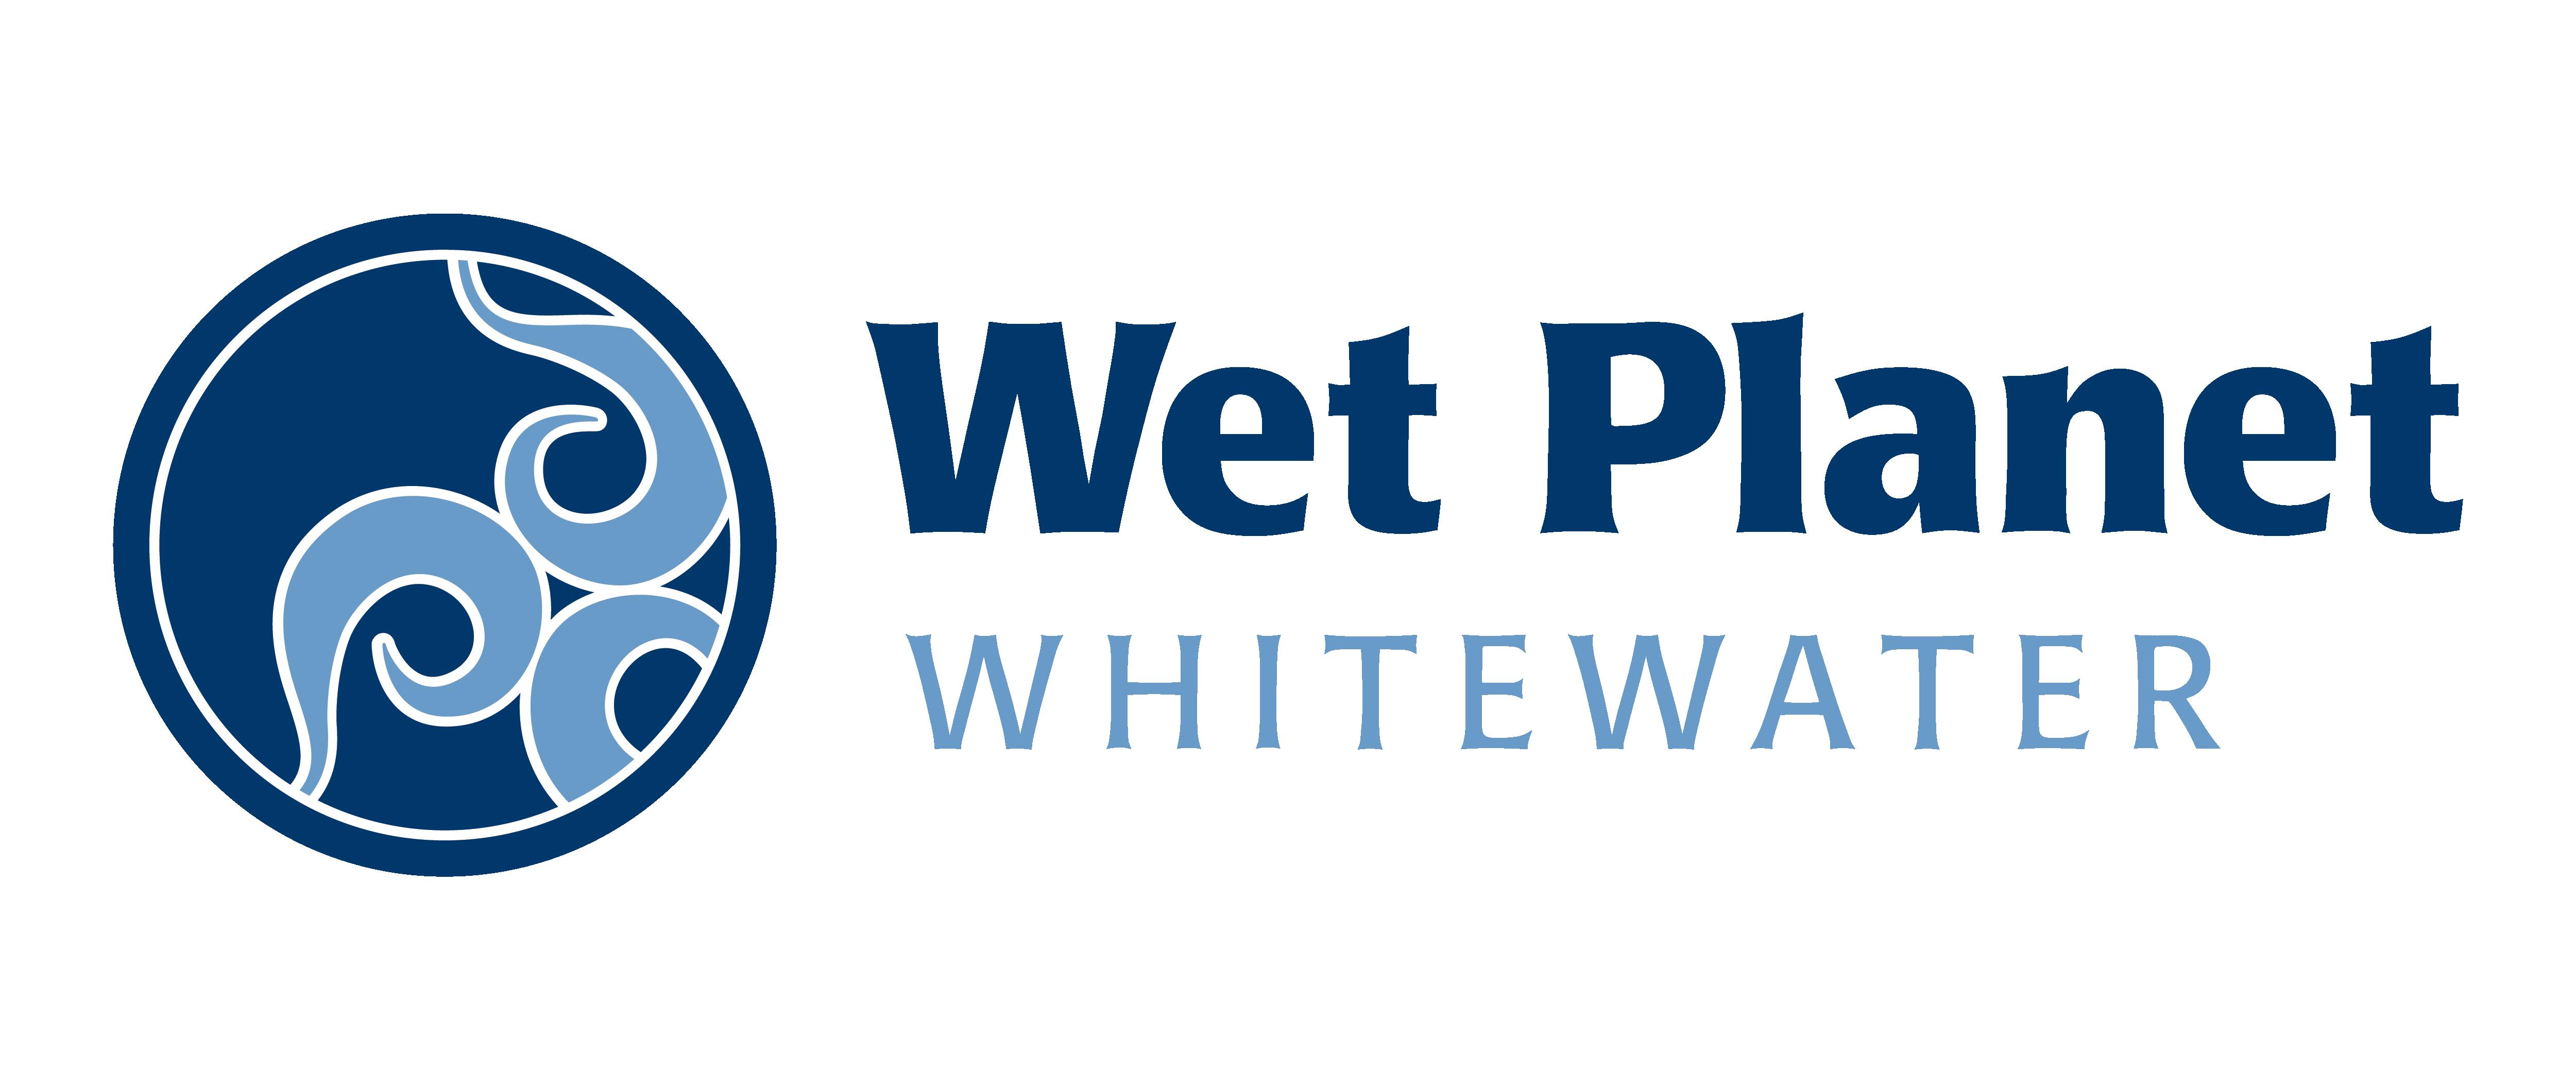 wet planet logo